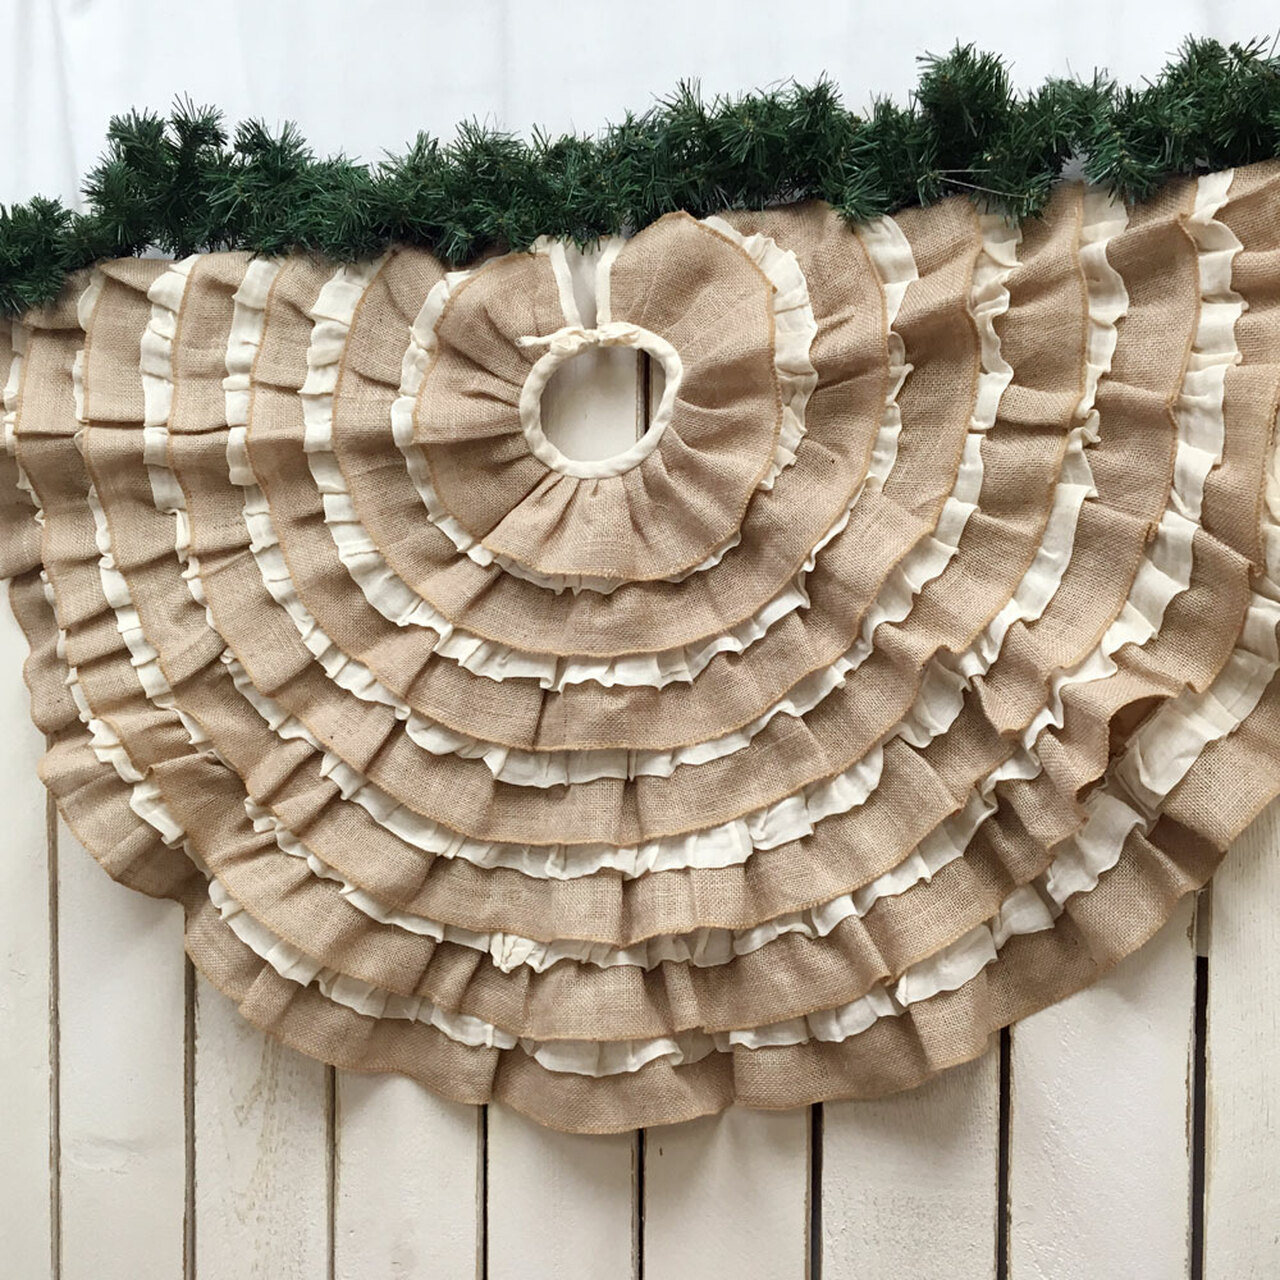 48 Ruffled Tobacco Cloth Burlap Christmas Tree Skirt Jubilee Fabric